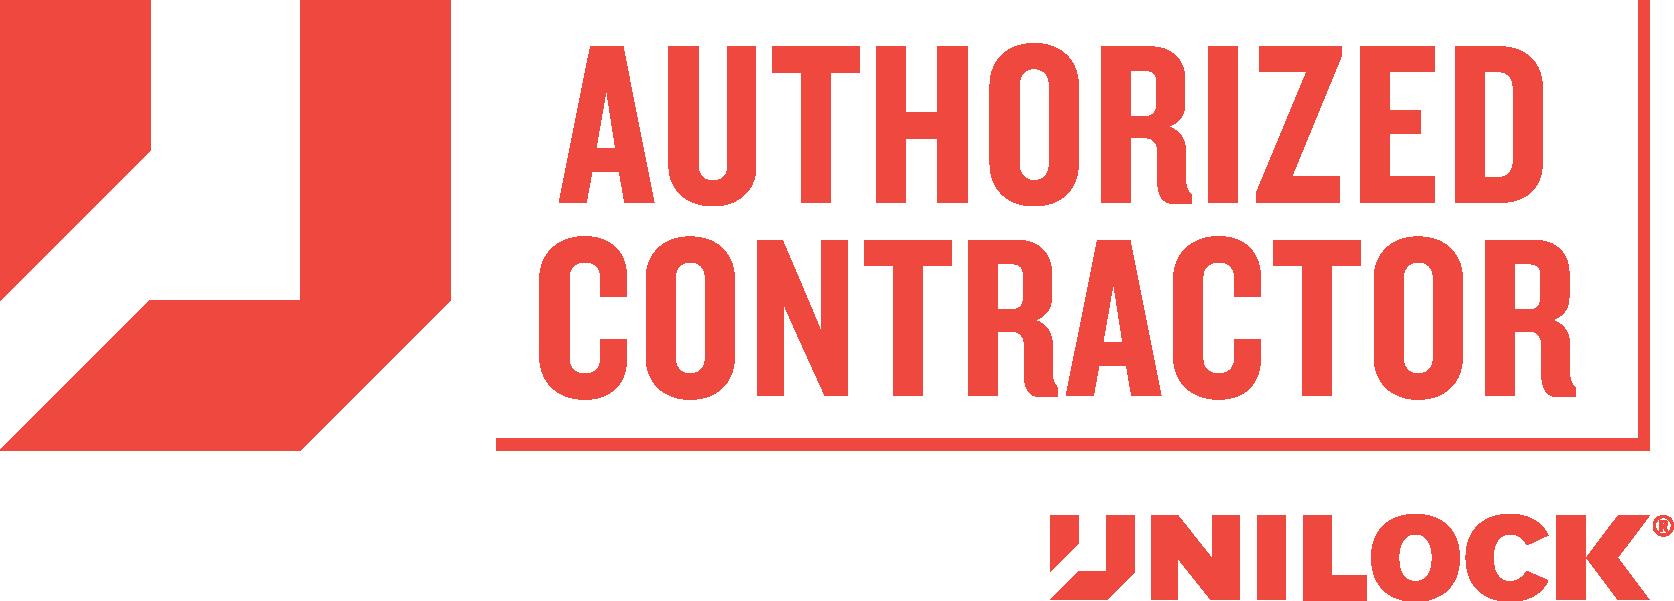 Unilock Authorized Contractor in Bloomfield Hills, MI, Metro Detroit